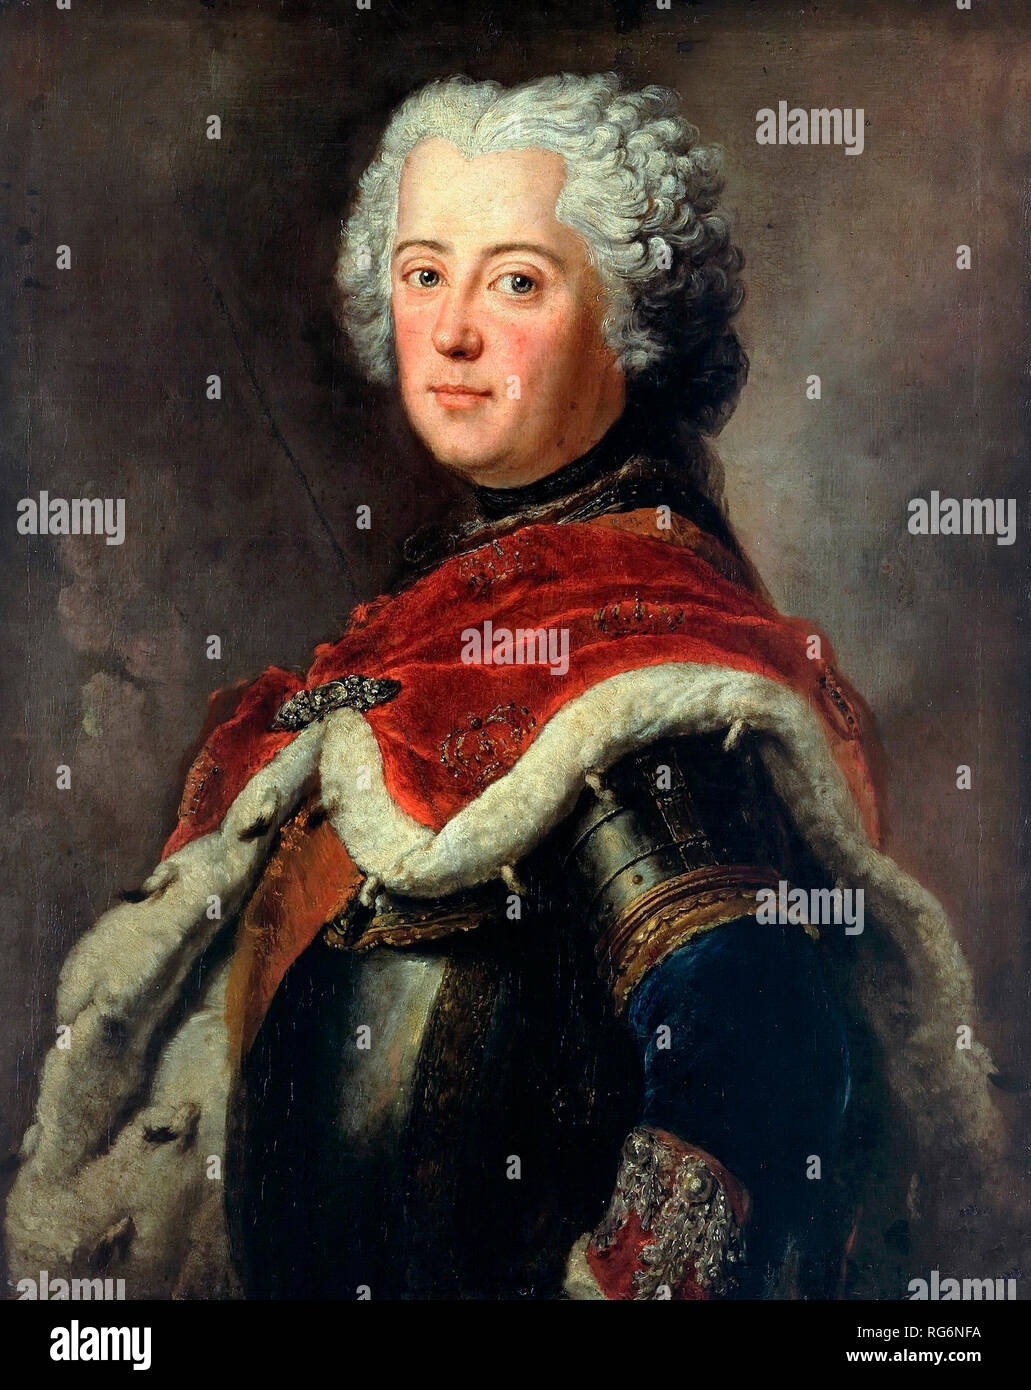 Frederick the Great as Crown Prince - Antoine Pesne, circa 1740 - Stock Image